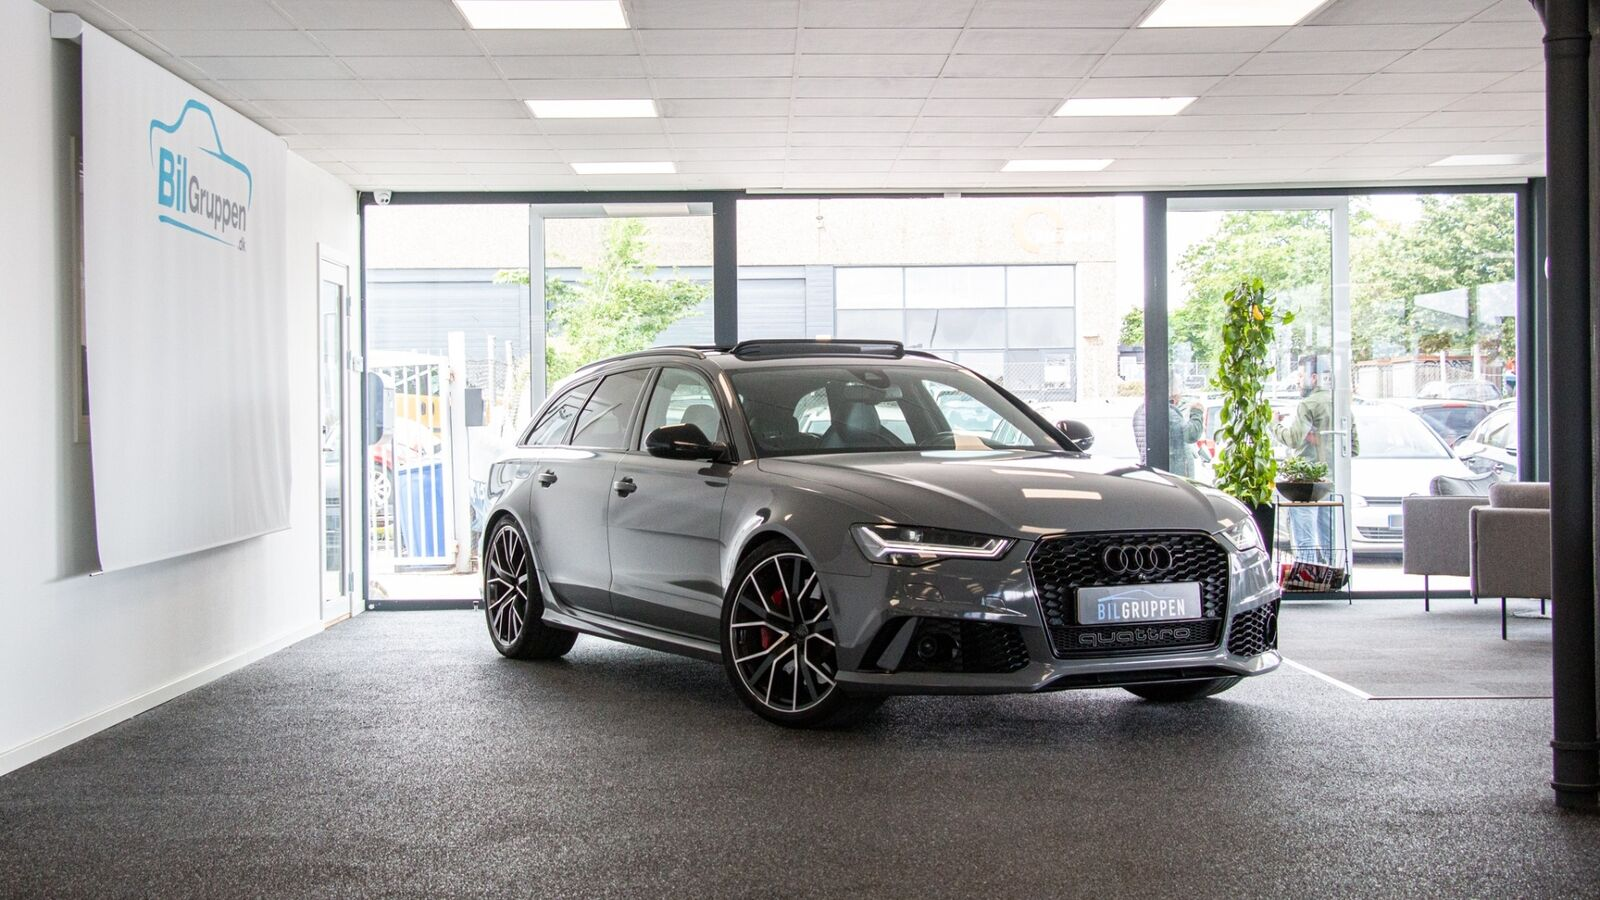 Audi RS6 4,0 TFSi Avant quattro Tiptr. 5d - 7.599 kr.